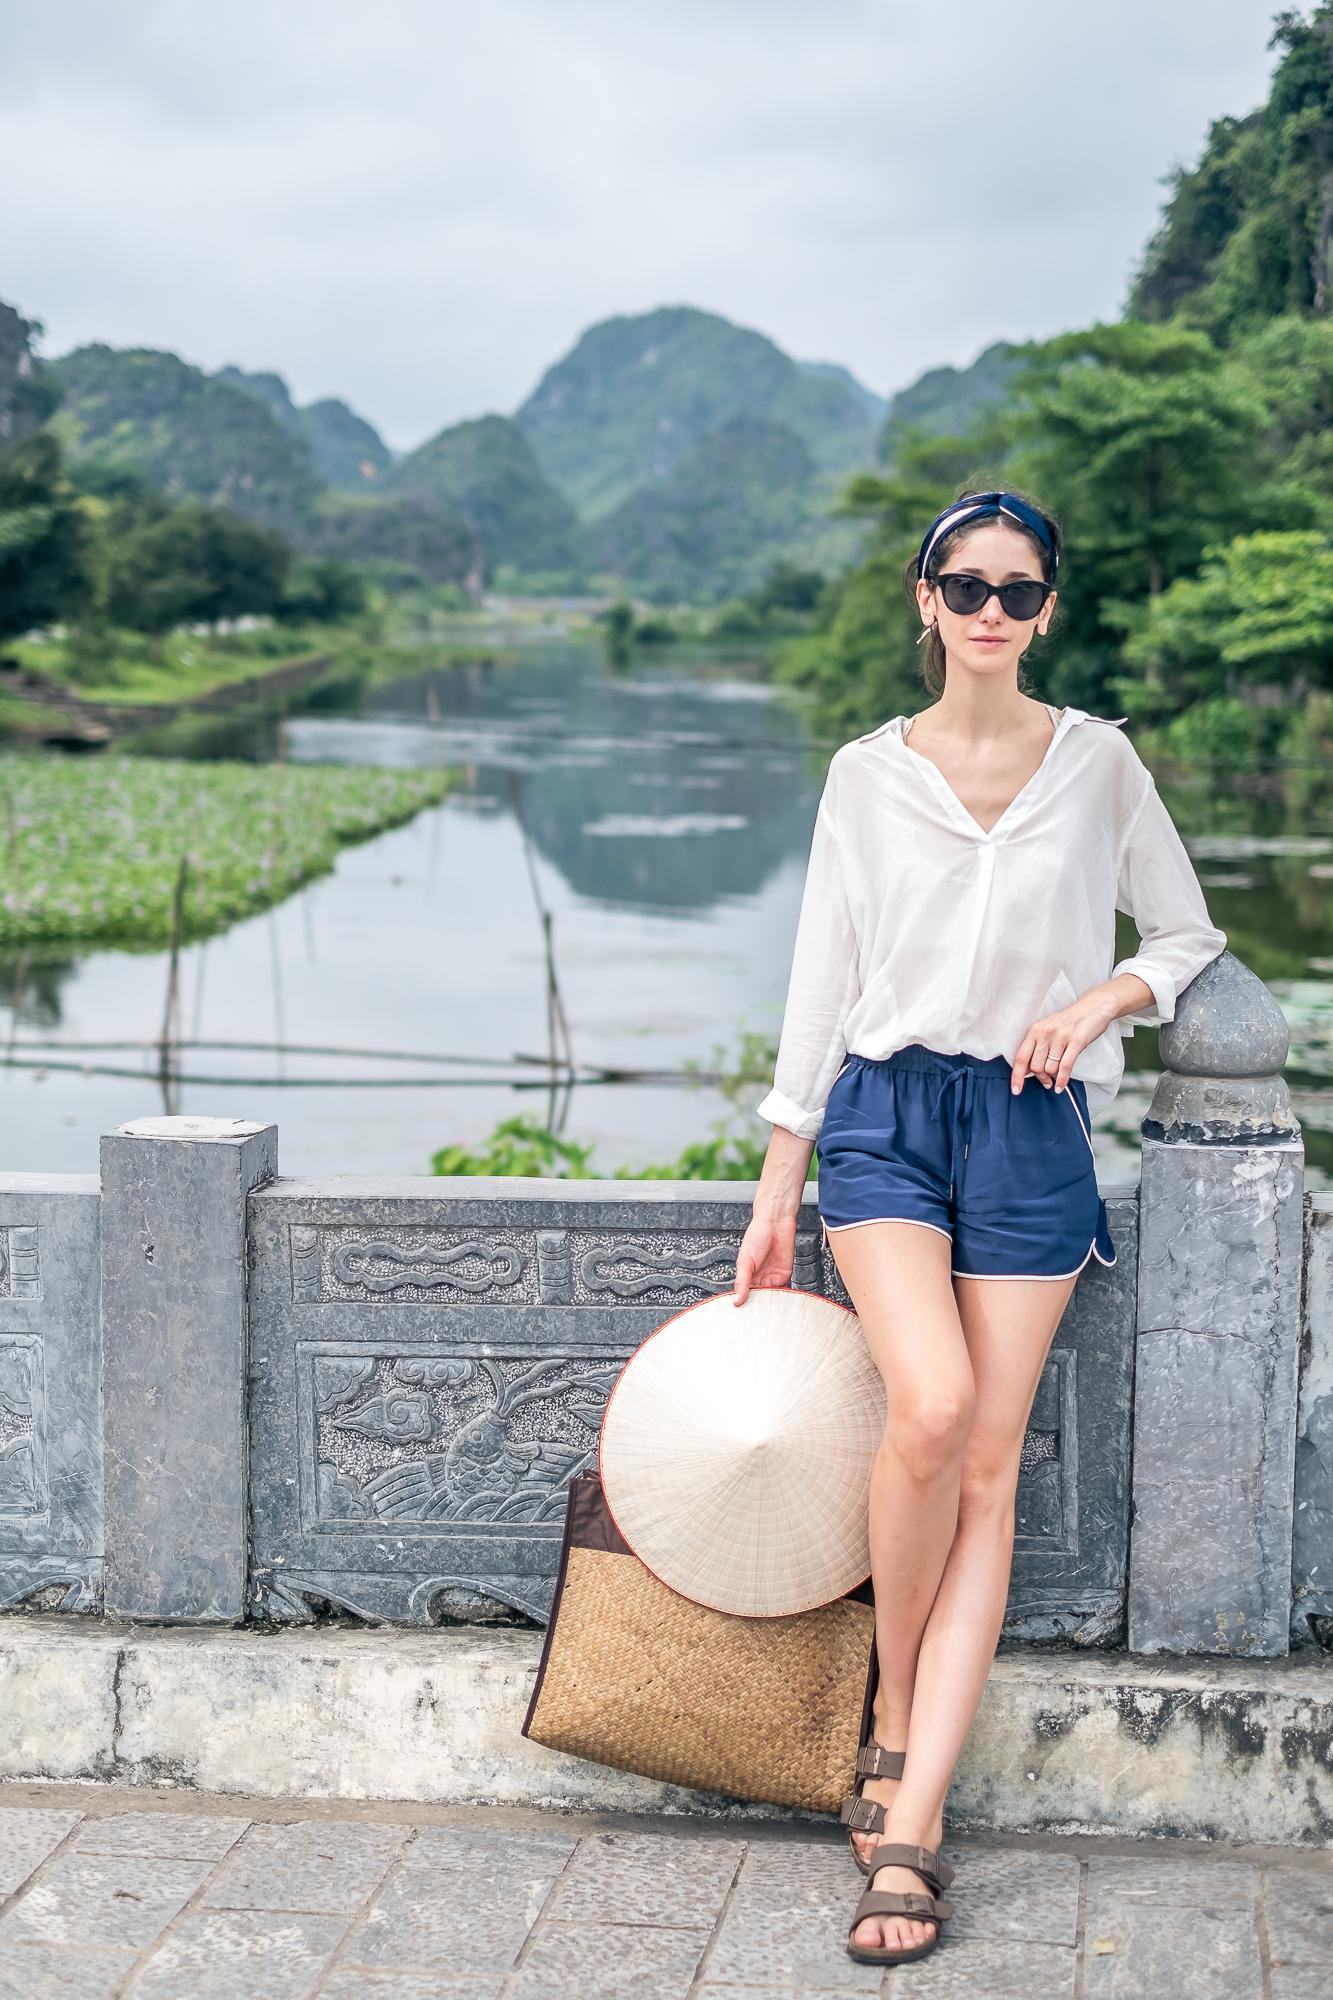 Vietnam_Honeymoon_TheOutsiderBlog_DSCF8630.JPG